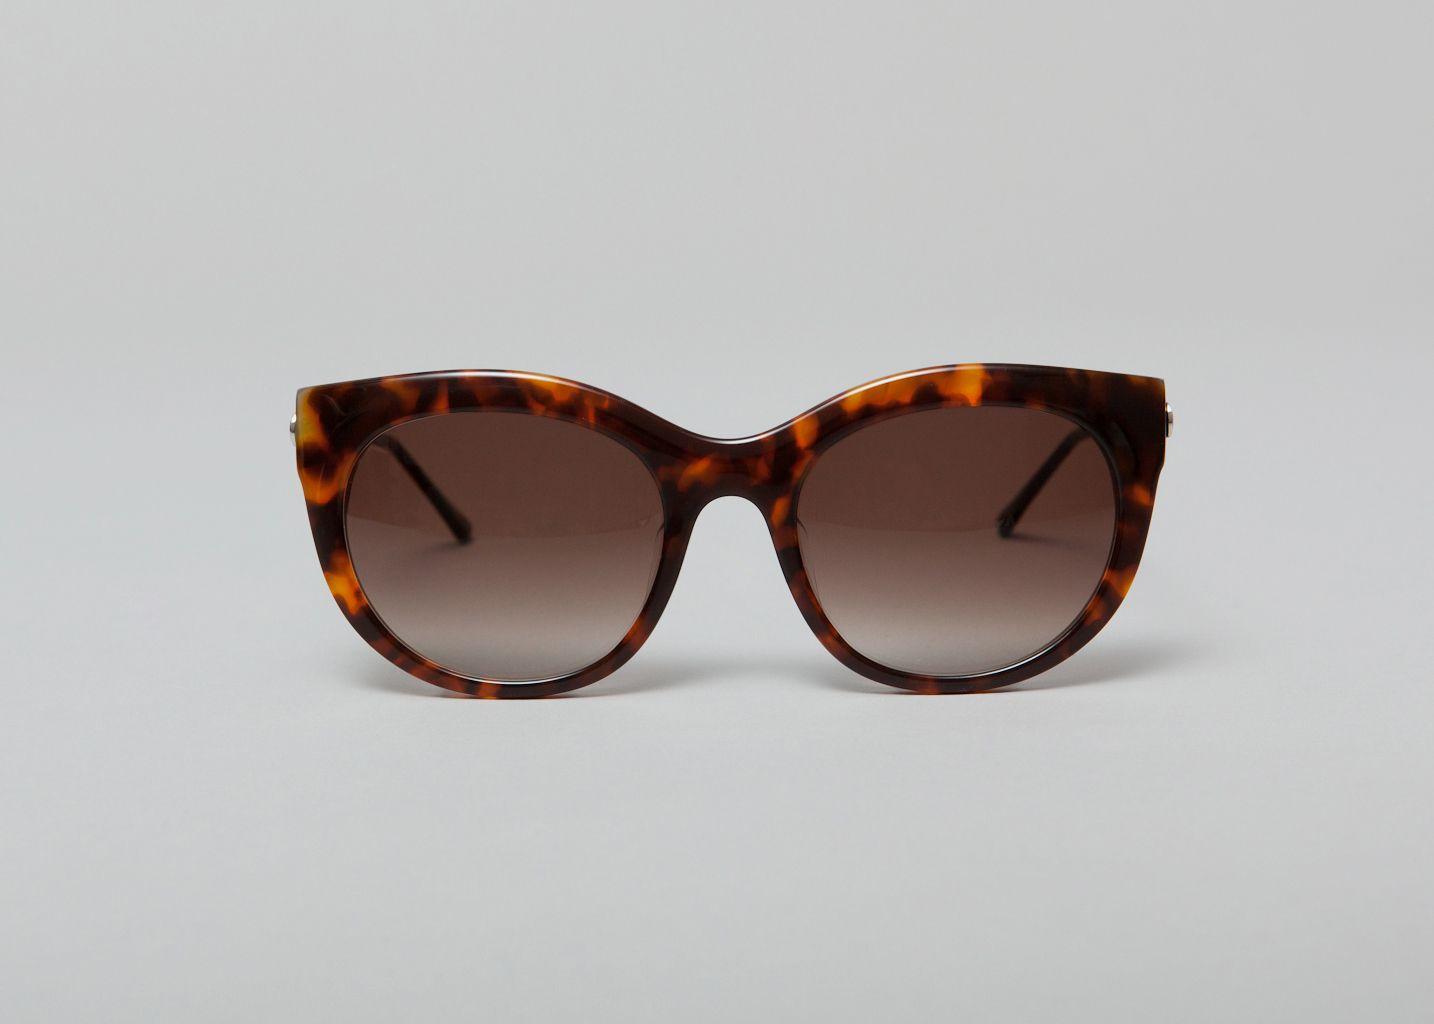 lunettes glitzy thierry lasry marron l 39 exception. Black Bedroom Furniture Sets. Home Design Ideas